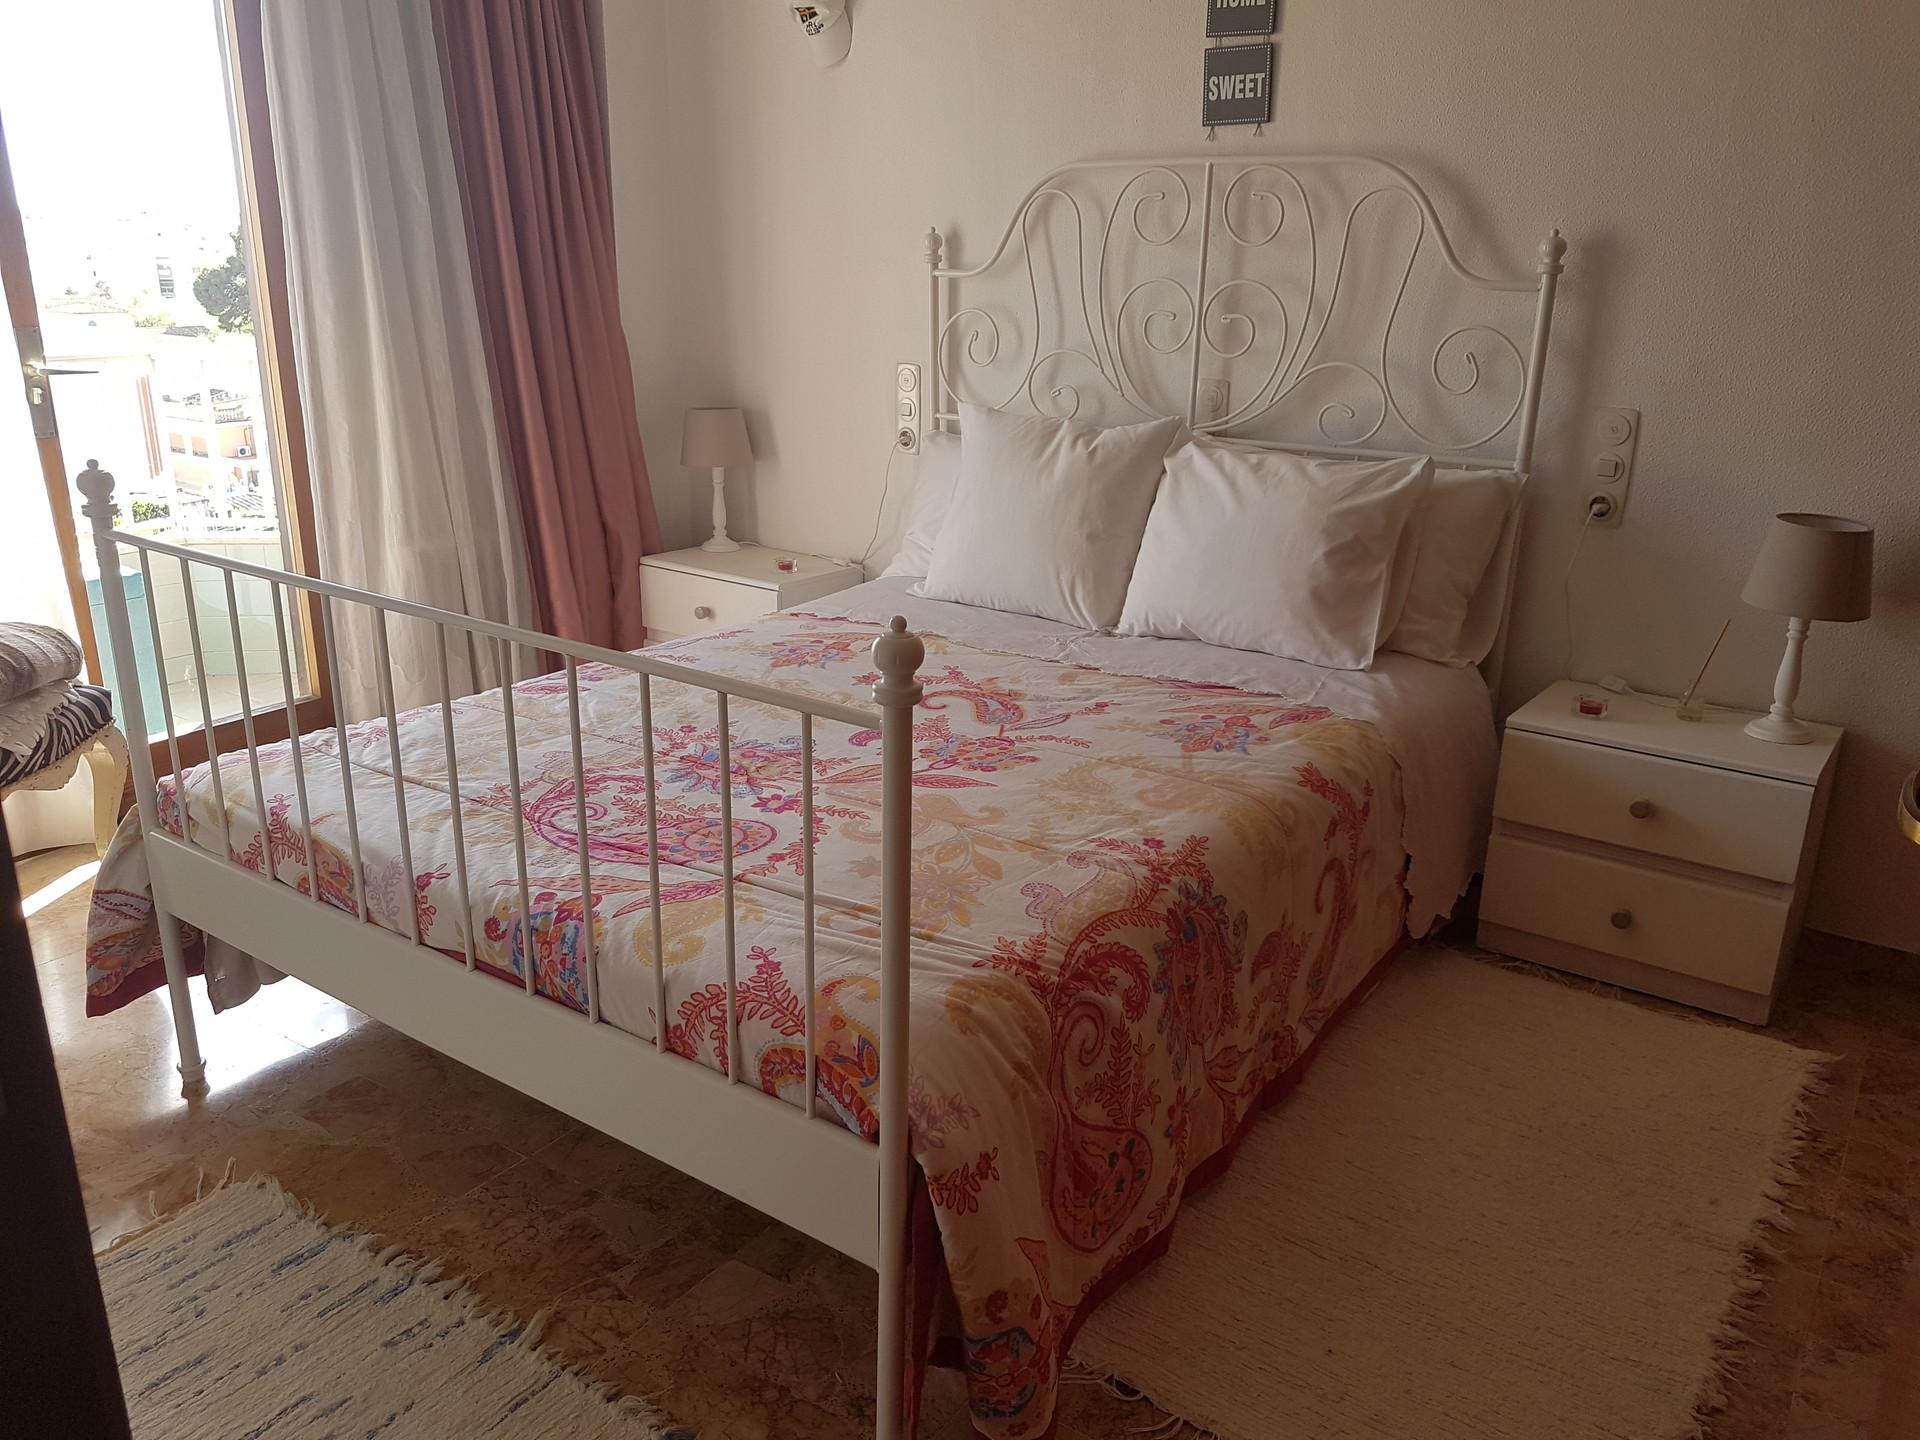 esplendida-habitacion-balcon-privado-93725911407111cb367a6fb65f2e30b7